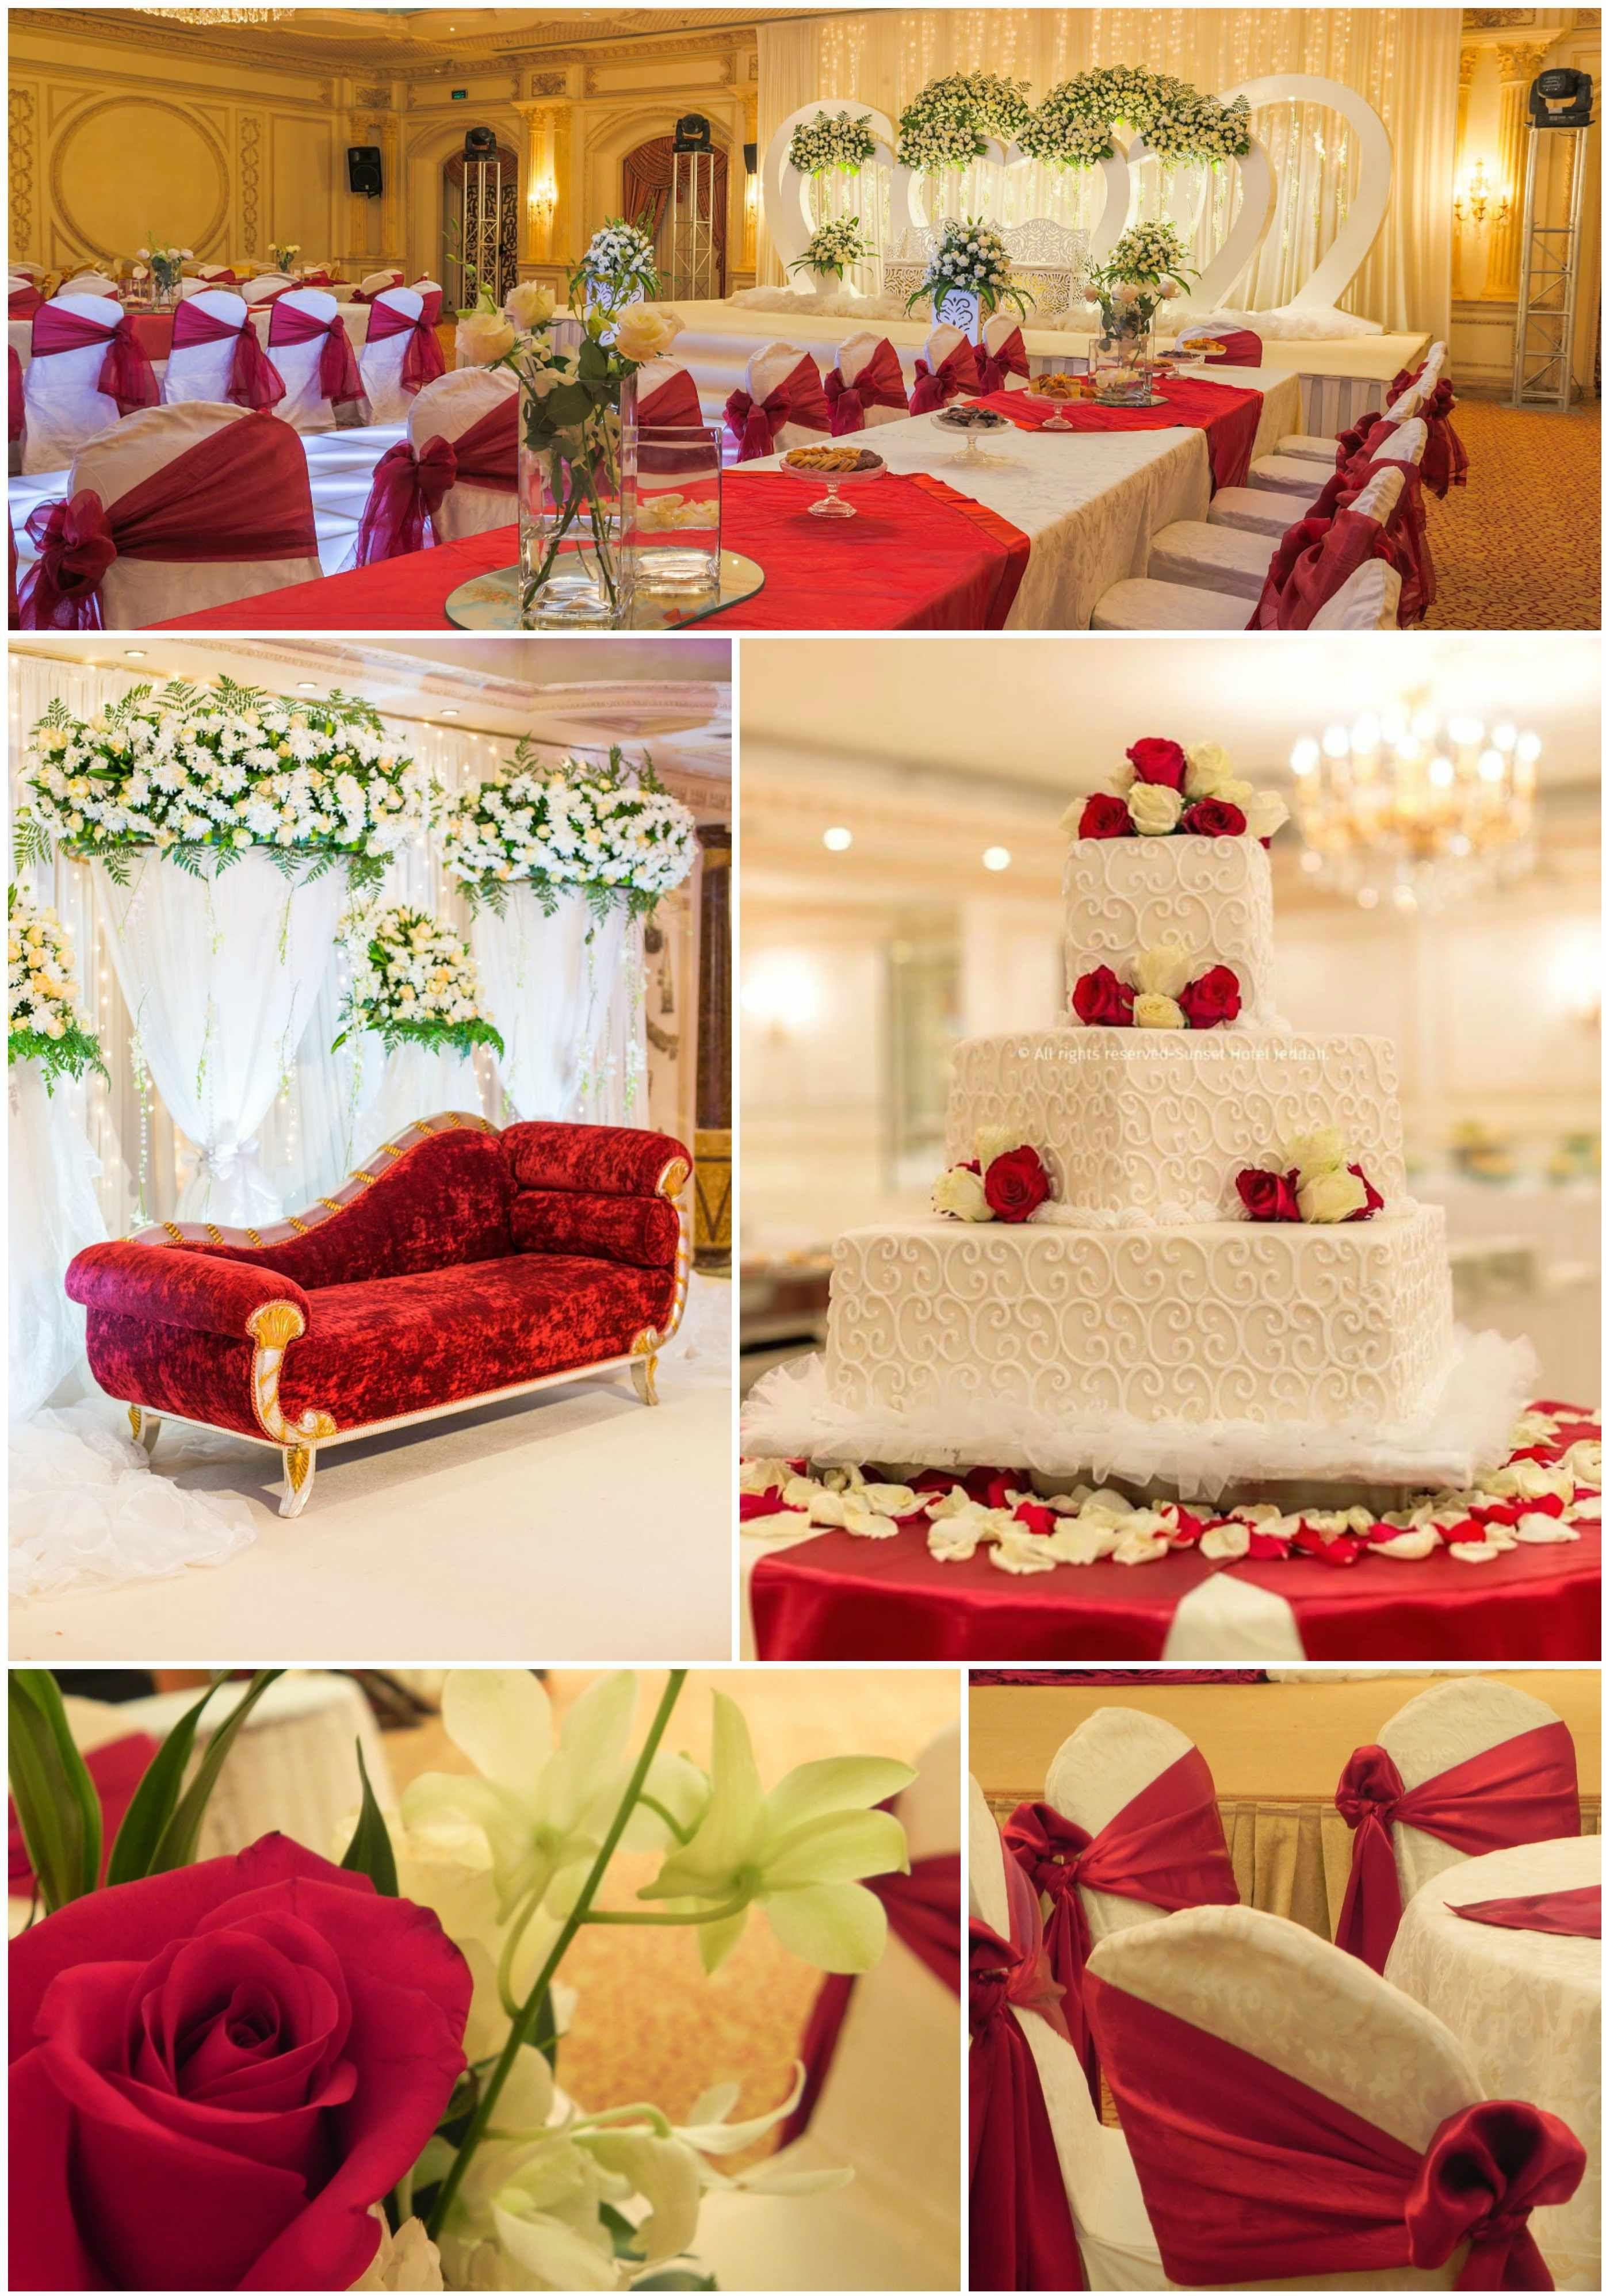 Red weddings at the sunset hotel jeddah bespoke weddings red weddings at the sunset hotel jeddah junglespirit Choice Image